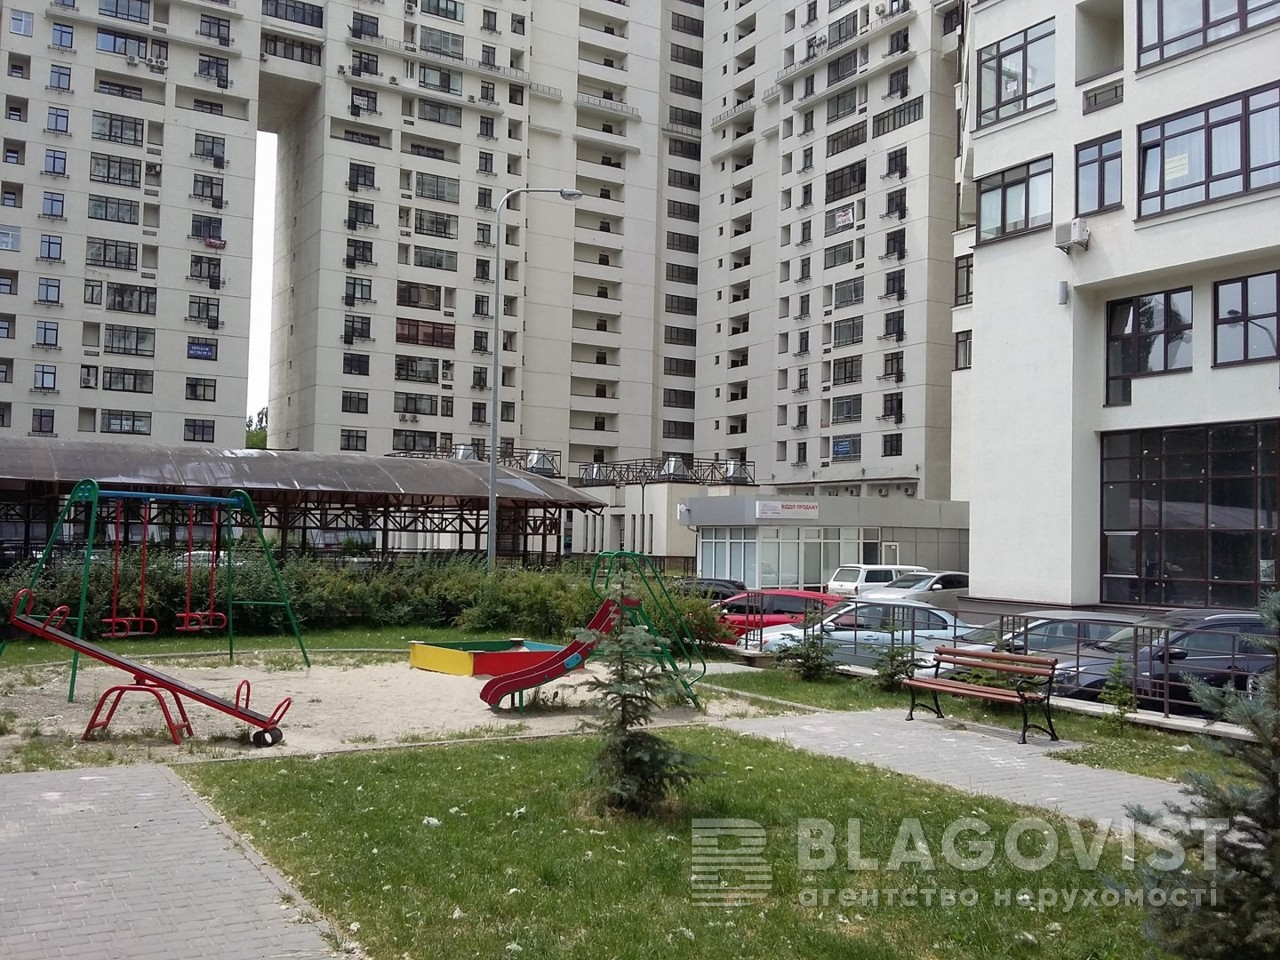 Нежитлове приміщення, H-34510, Коновальця Євгена (Щорса), Київ - Фото 13